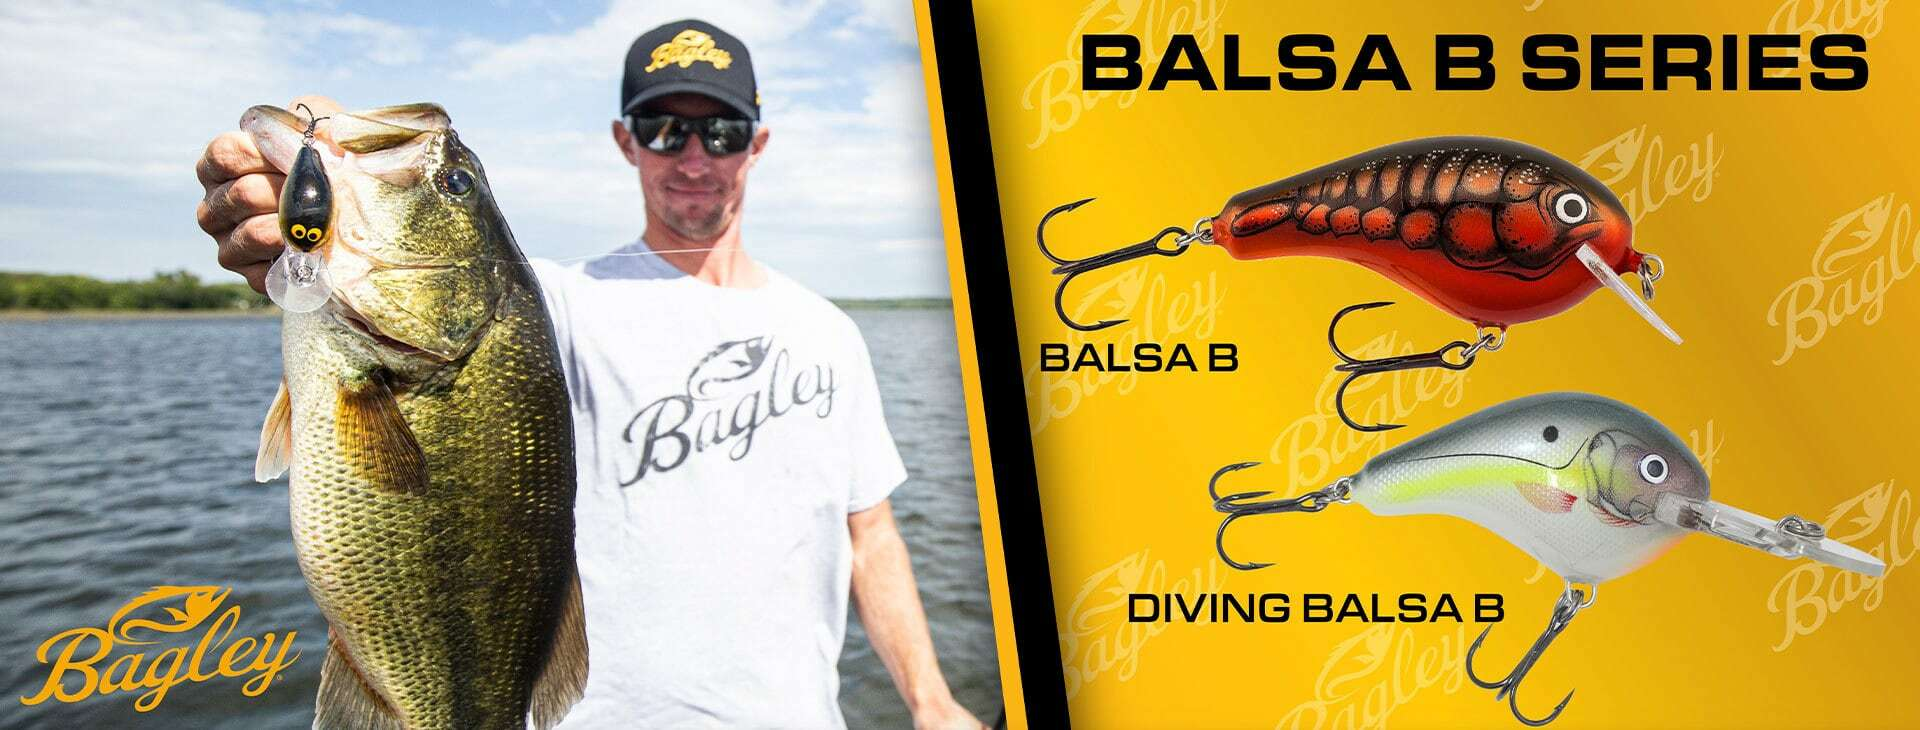 Balsa B Series